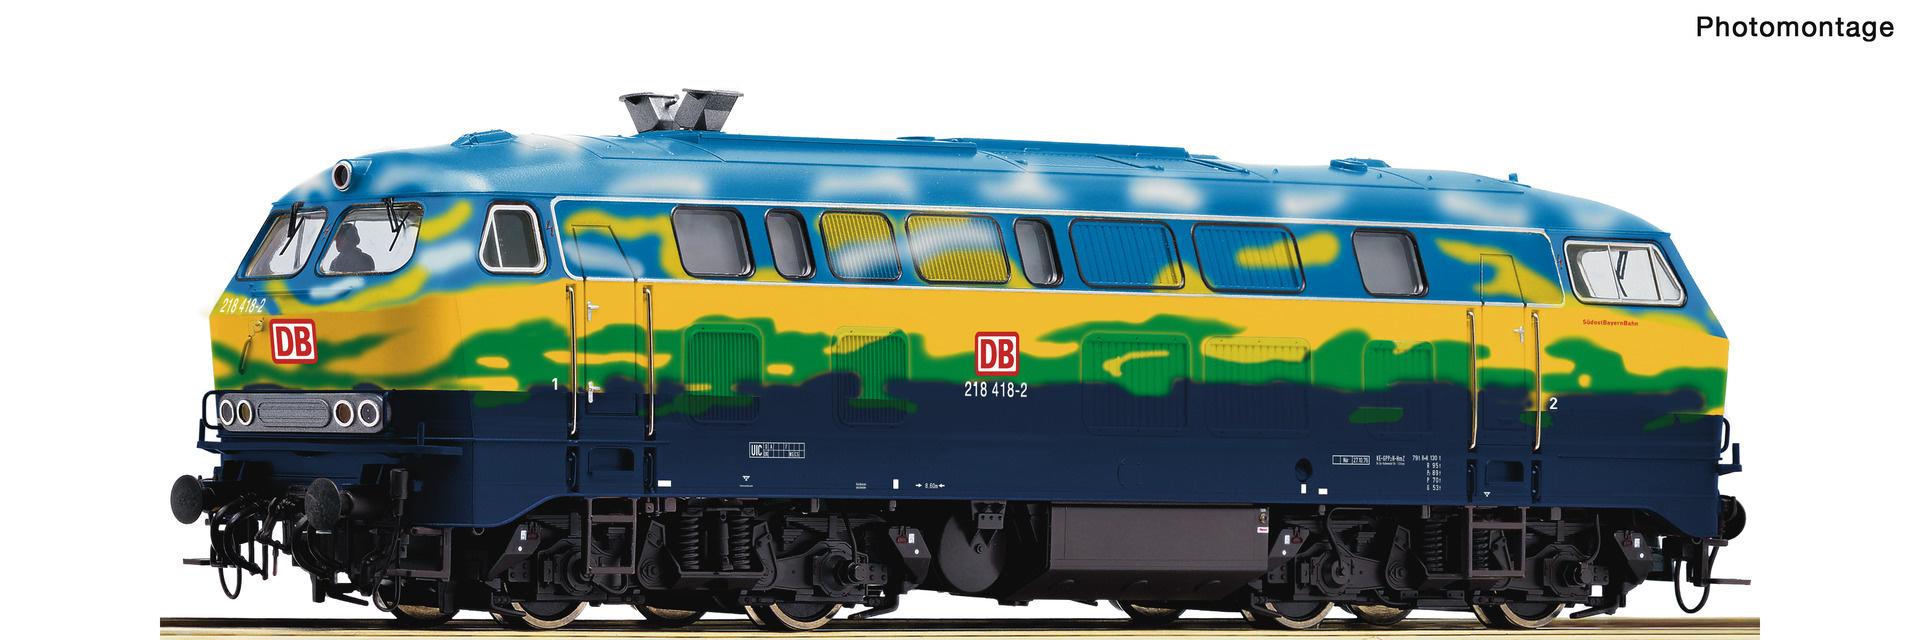 70757 Diesellok BR 218 Touristik-1